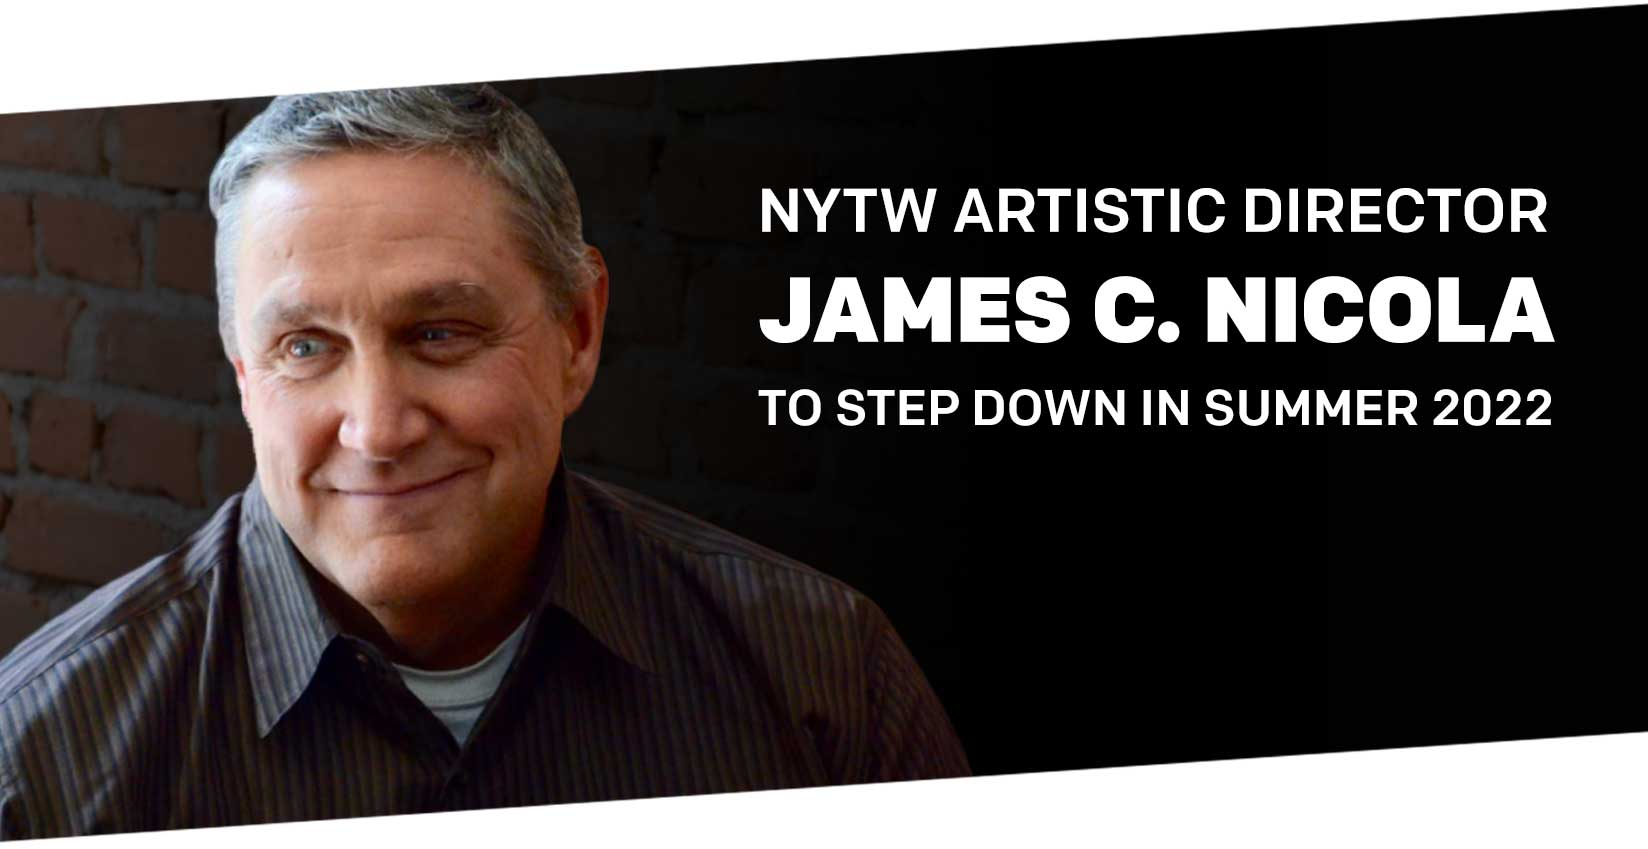 NYTW Artistic Director James C. Nicola